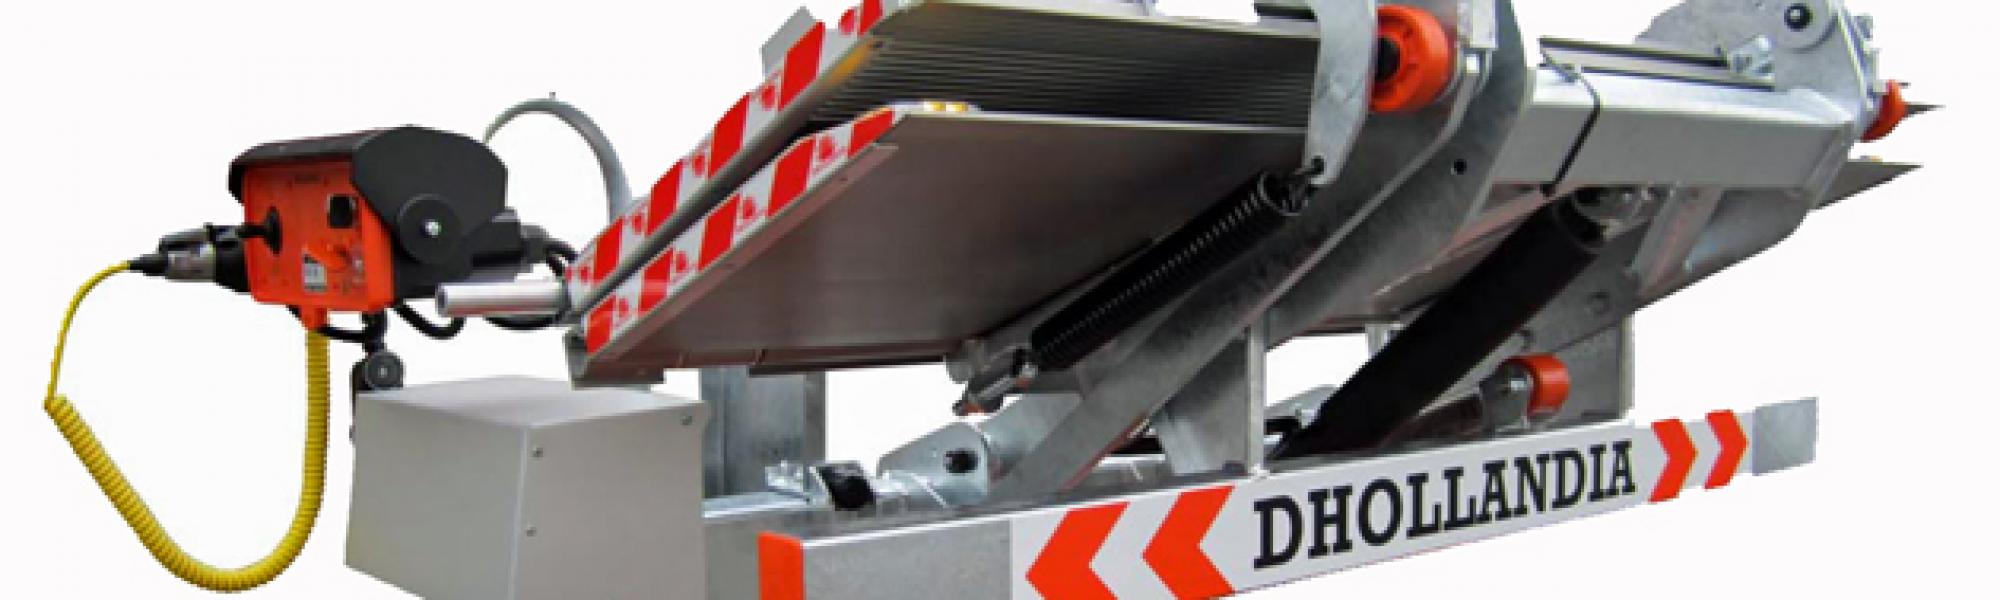 Dhollandia Tail Lift Wiring Diagram: Kurt Hobbs Coachworks - Tail  Liftsrh:kurthobbscoachworks.co